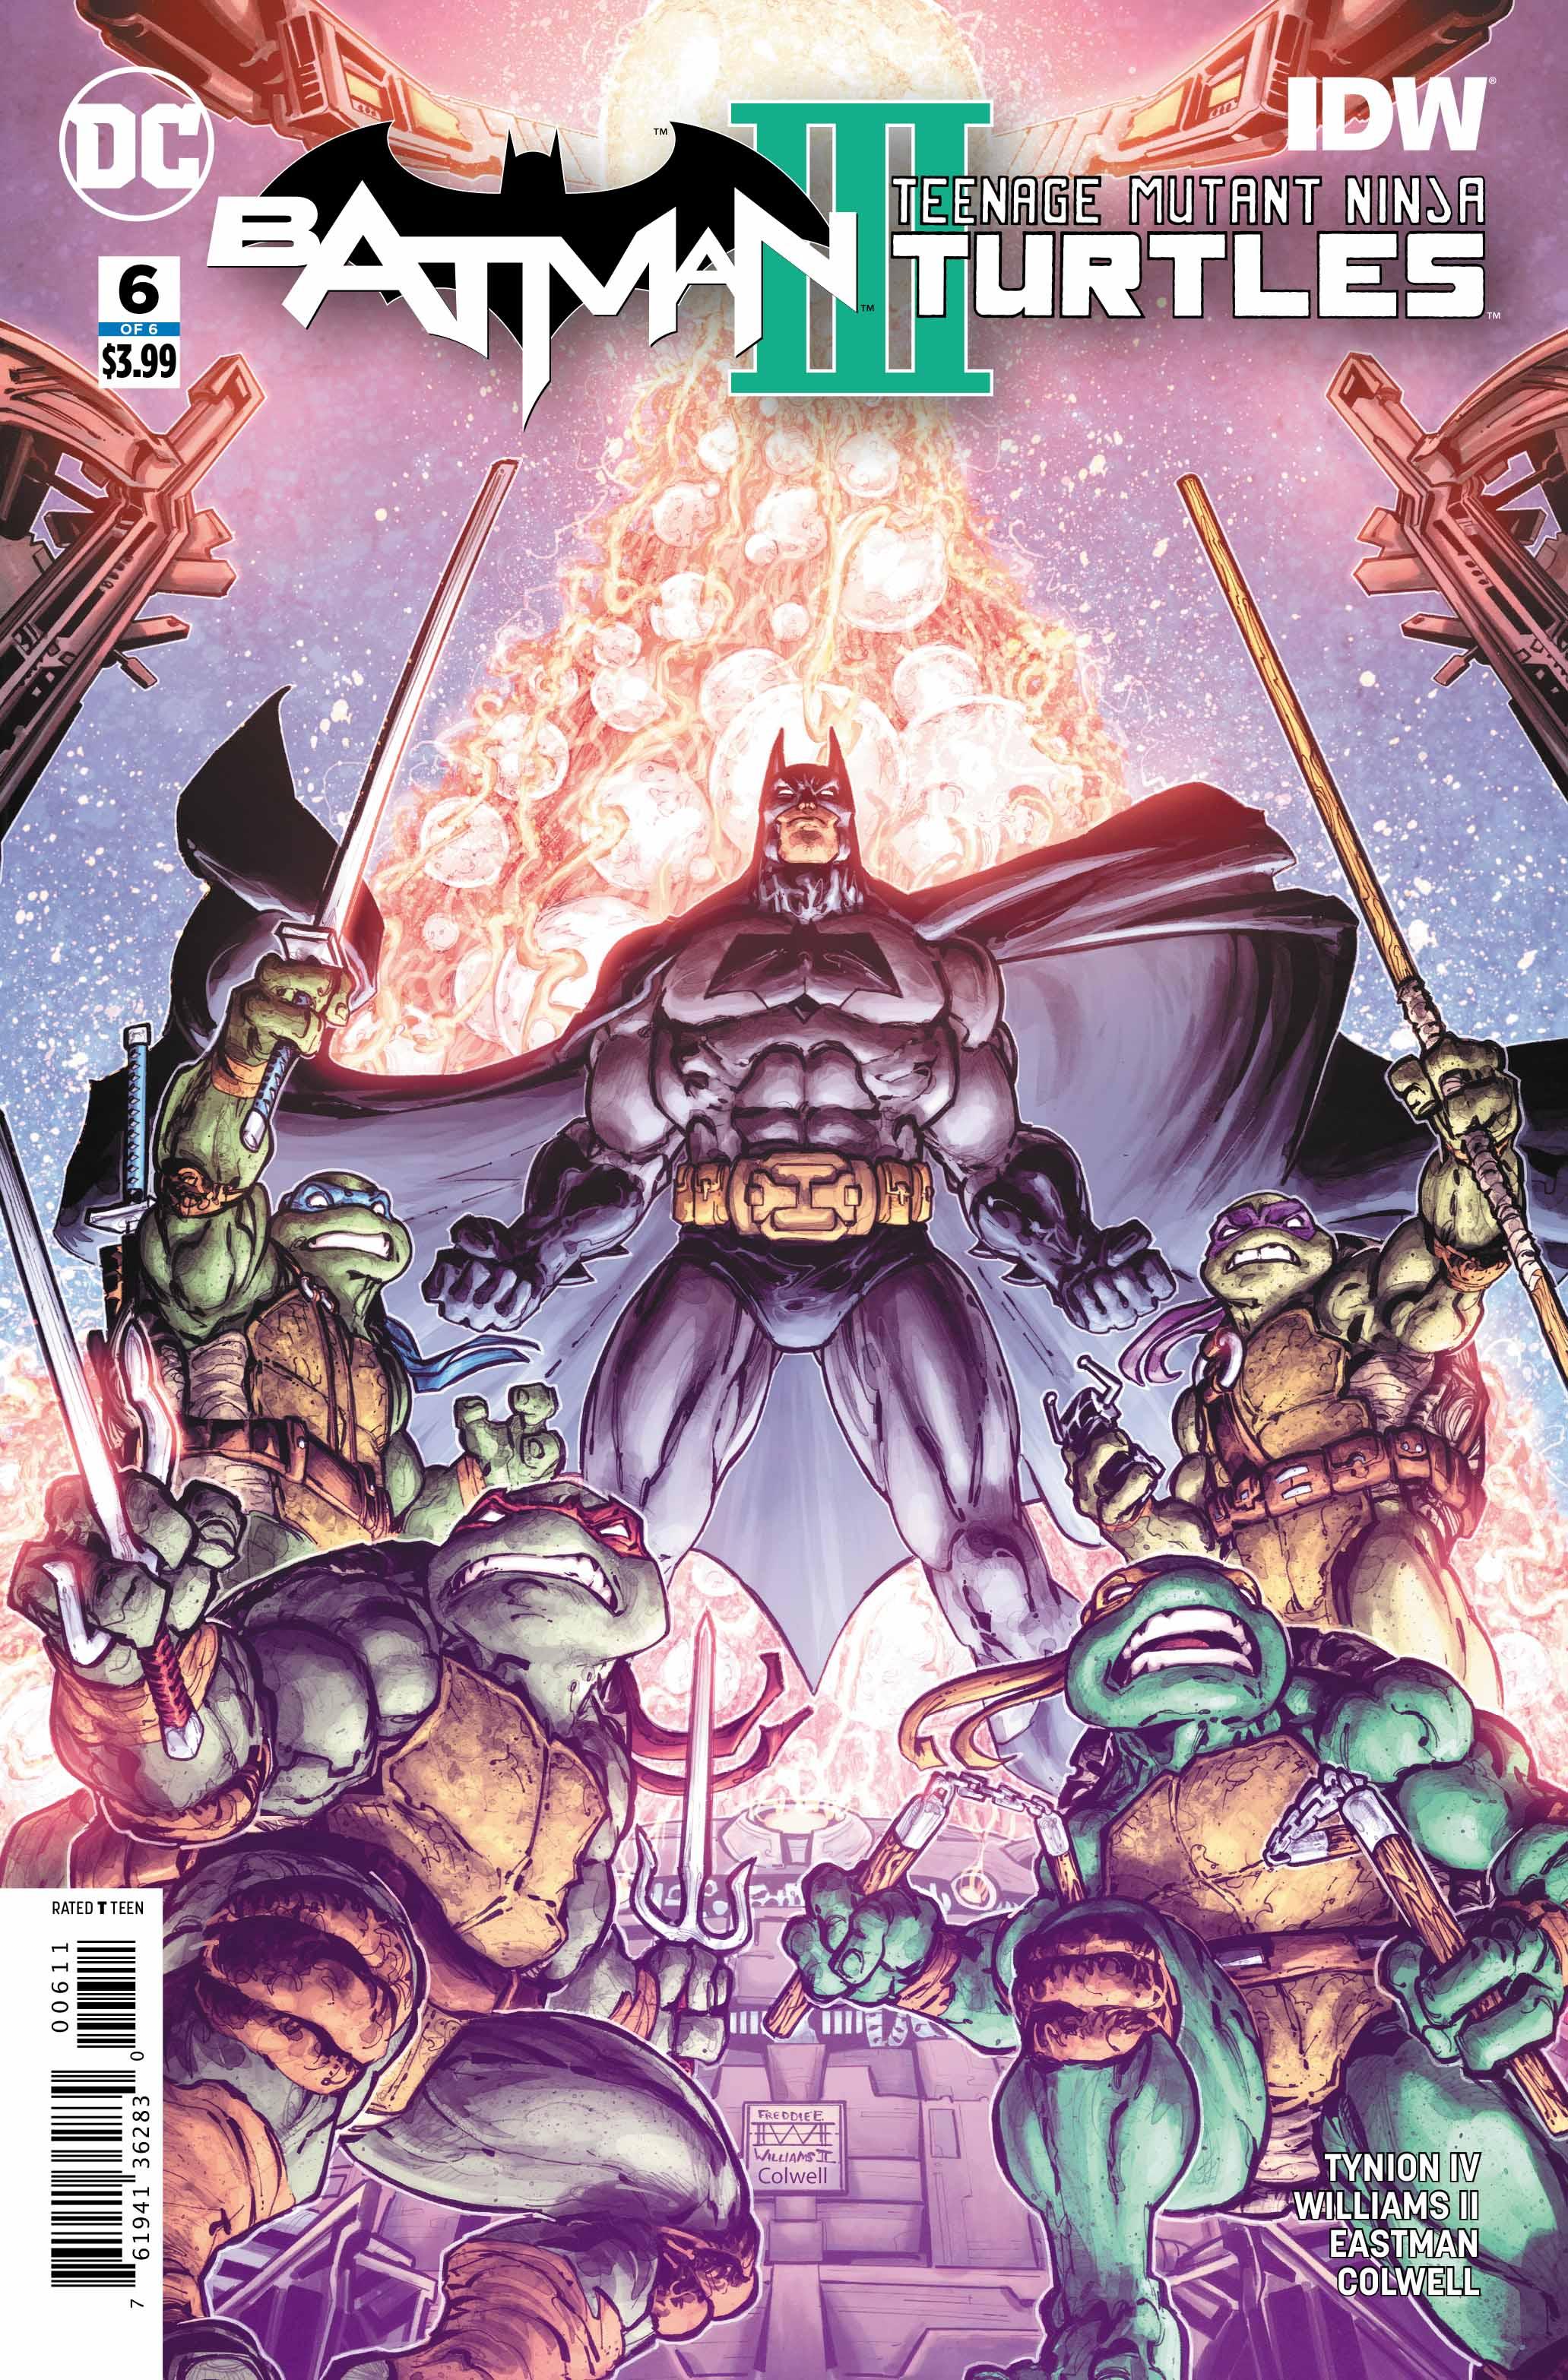 Preview: Batman/Teenage Mutant Ninja Turtles III #6 (of 6)